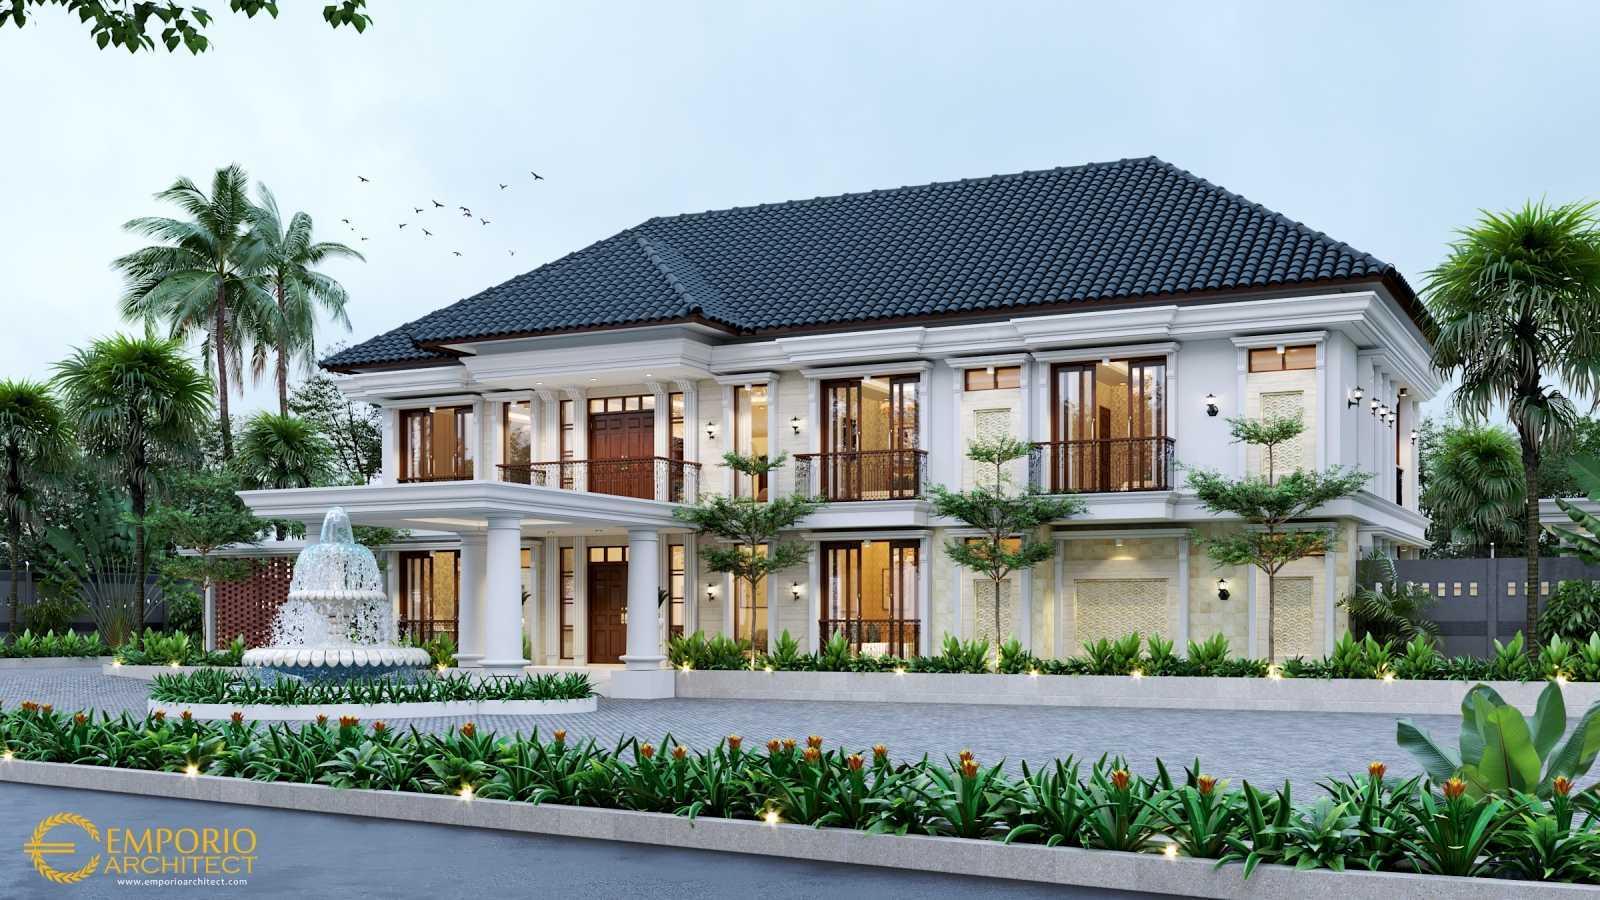 Emporio Architect Jasa Arsitek Bangka Belitung Desain Rumah Classic Tropis 554 @ Bangka Belitung Kepulauan Bangka Belitung, Indonesia Kepulauan Bangka Belitung, Indonesia Emporio-Architect-Jasa-Arsitek-Bangka-Belitung-Desain-Rumah-Classic-Tropis-554-Bangka-Belitung  79847